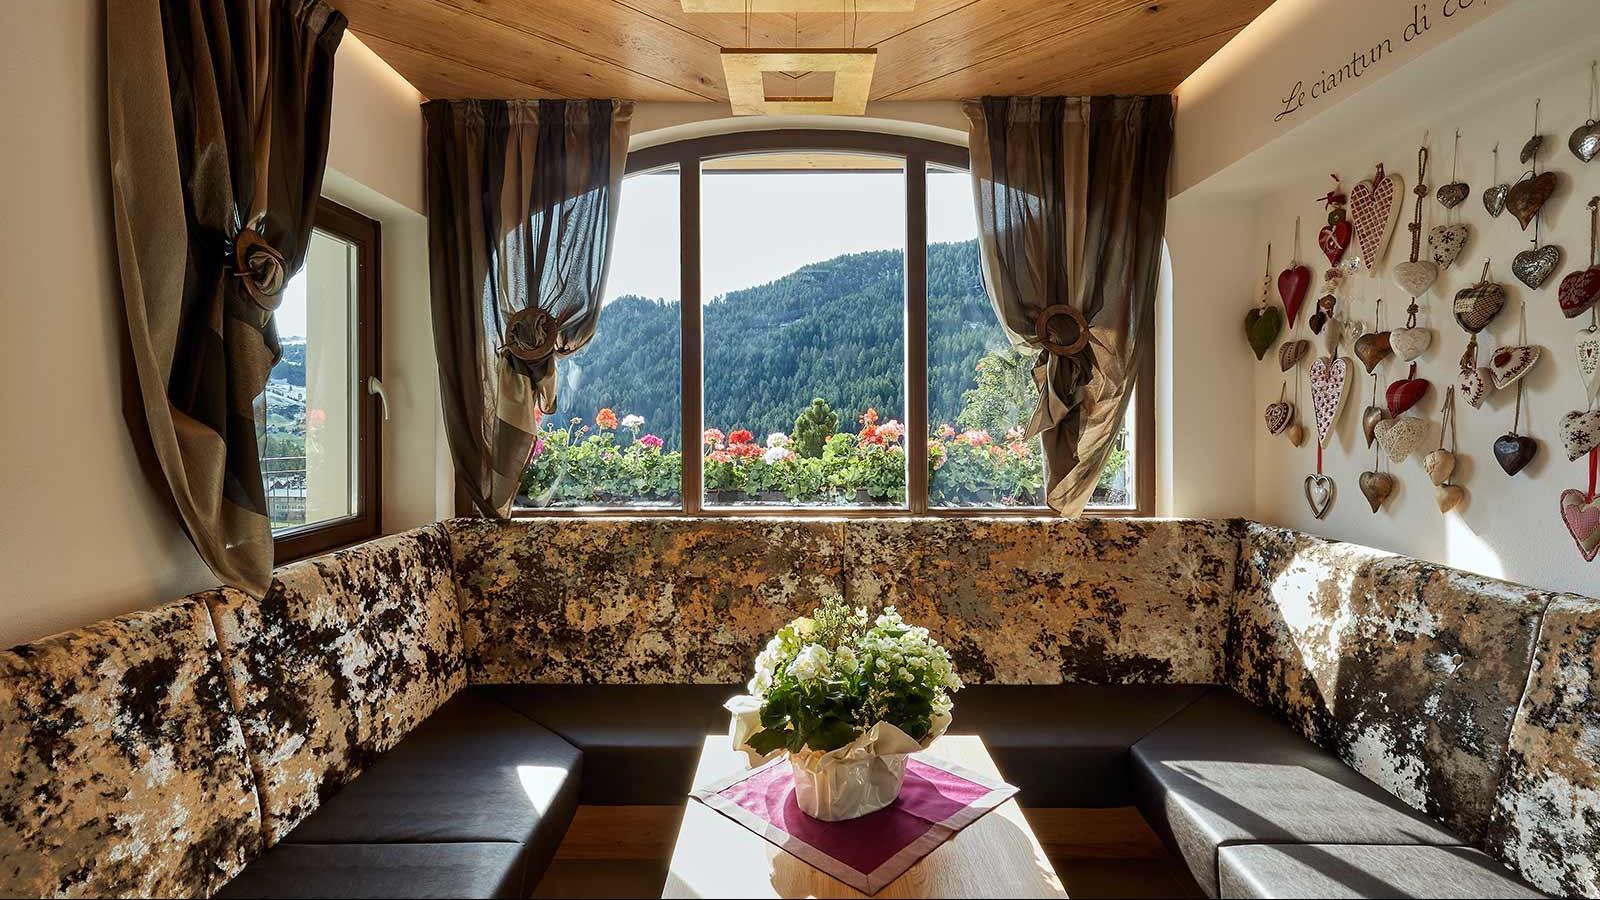 Hotel Mezdi, Corvara and Colfosco - Views from inside